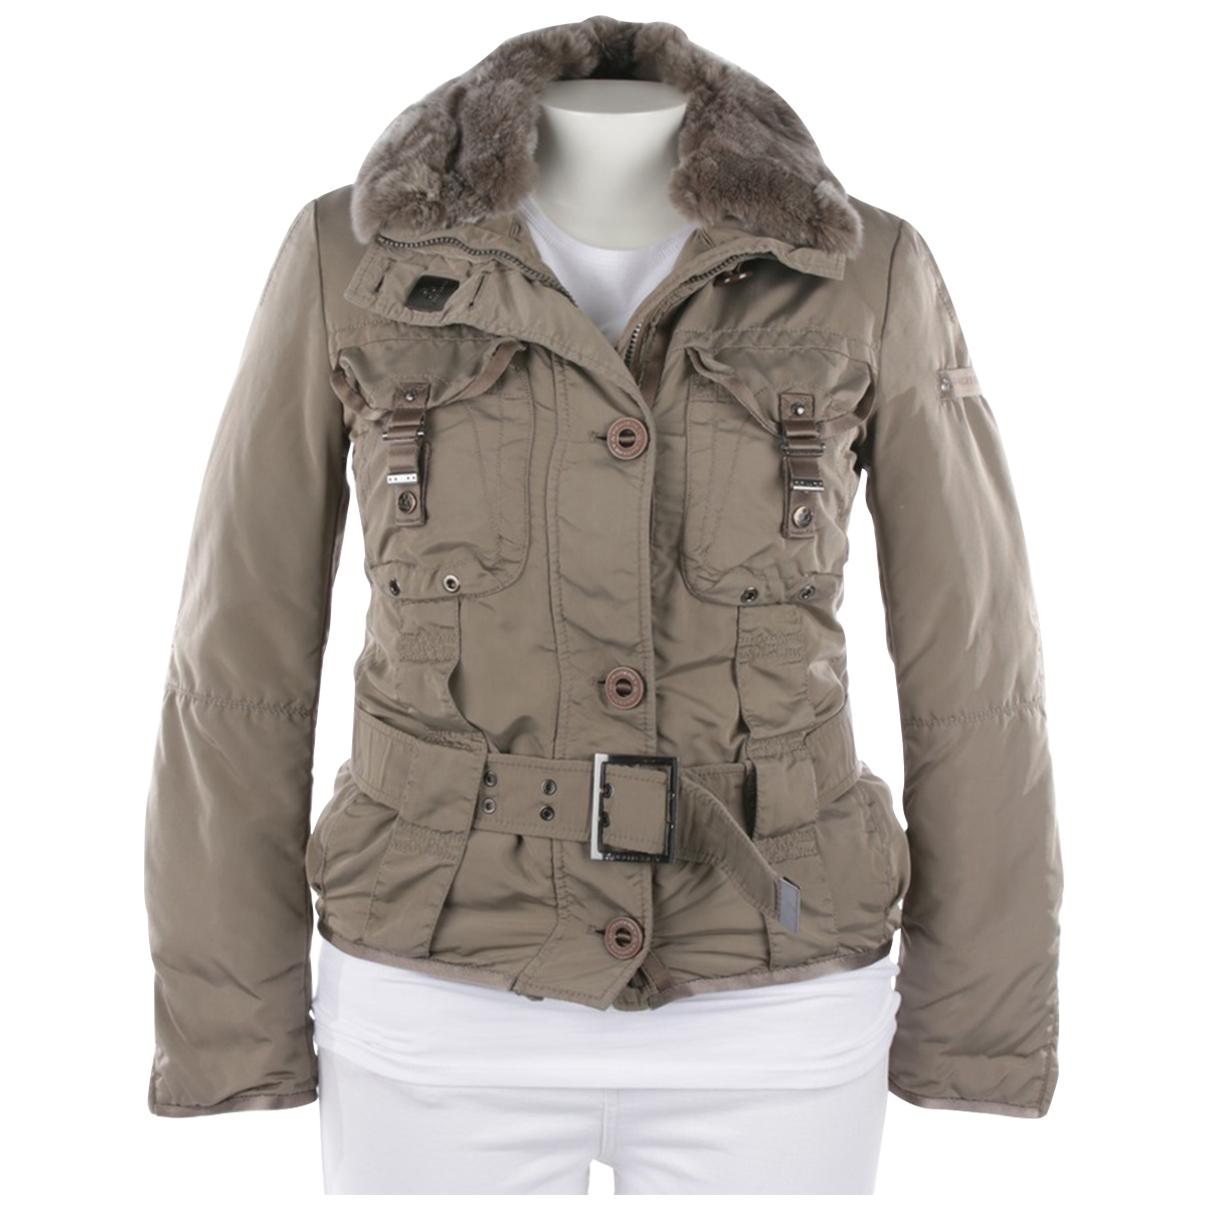 Peuterey \N Beige jacket for Women 38 FR